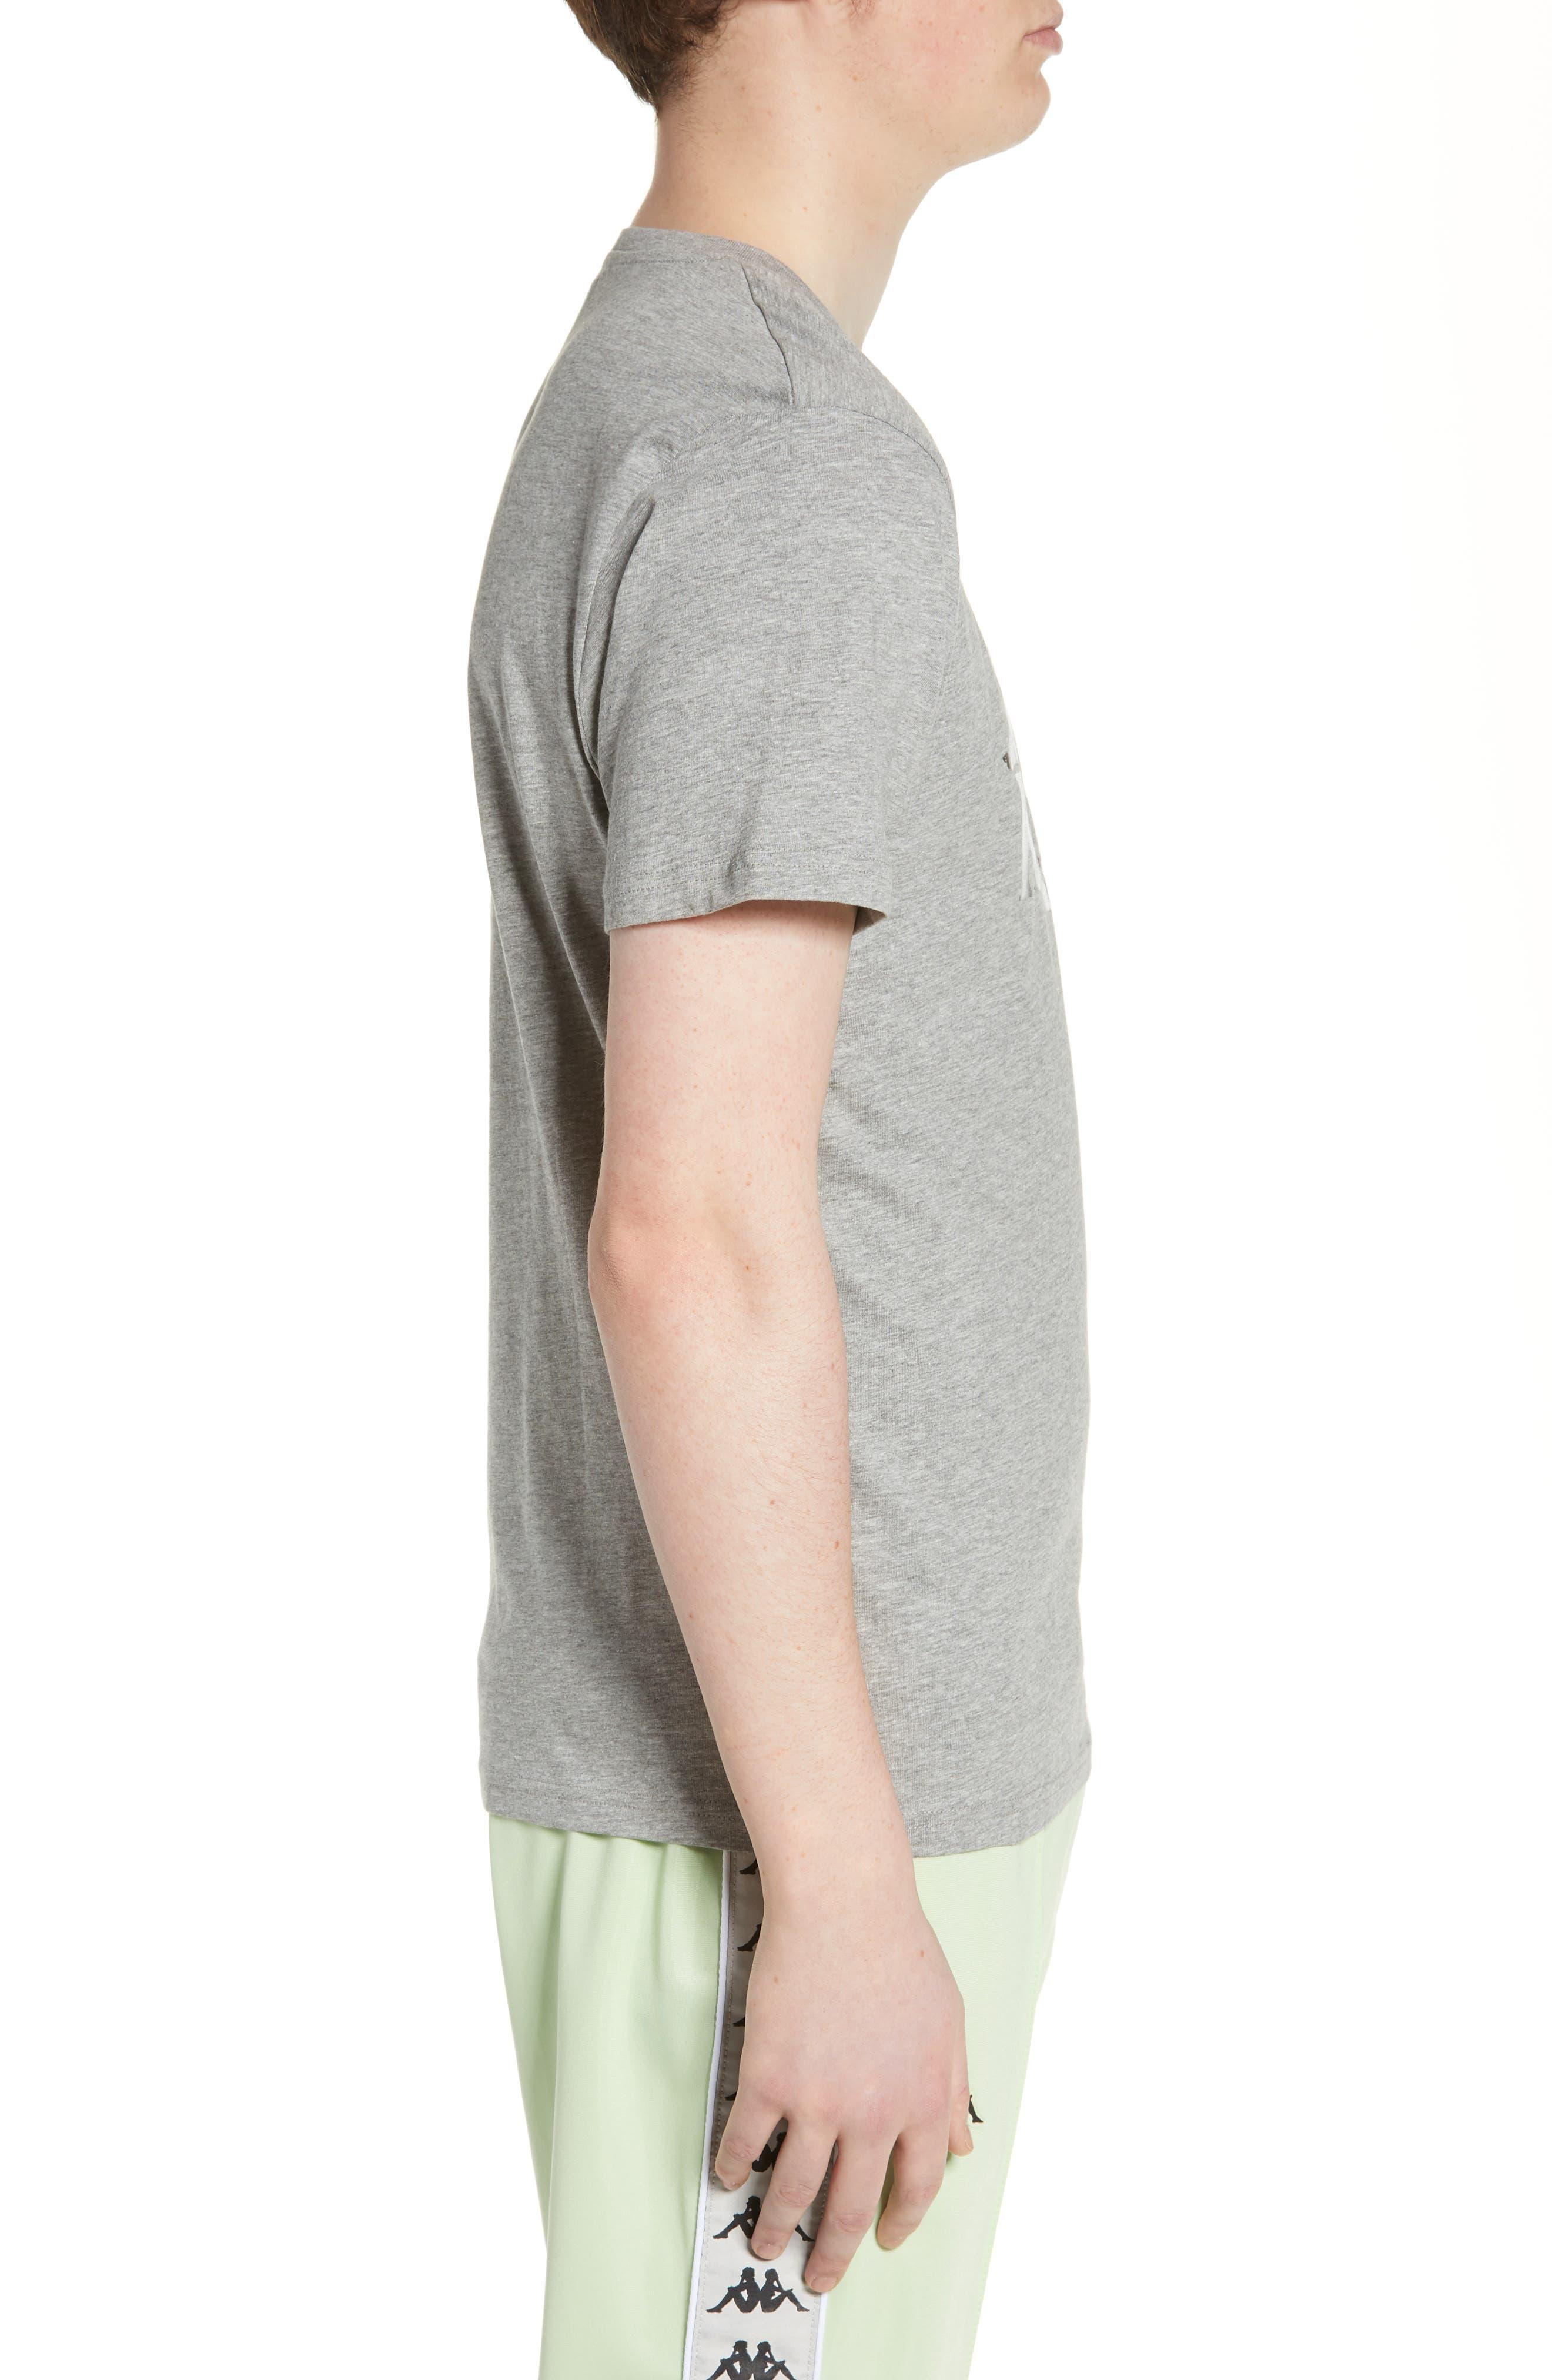 KAPPA,                             Estessi Graphic T-Shirt,                             Alternate thumbnail 3, color,                             HEATHER GREY